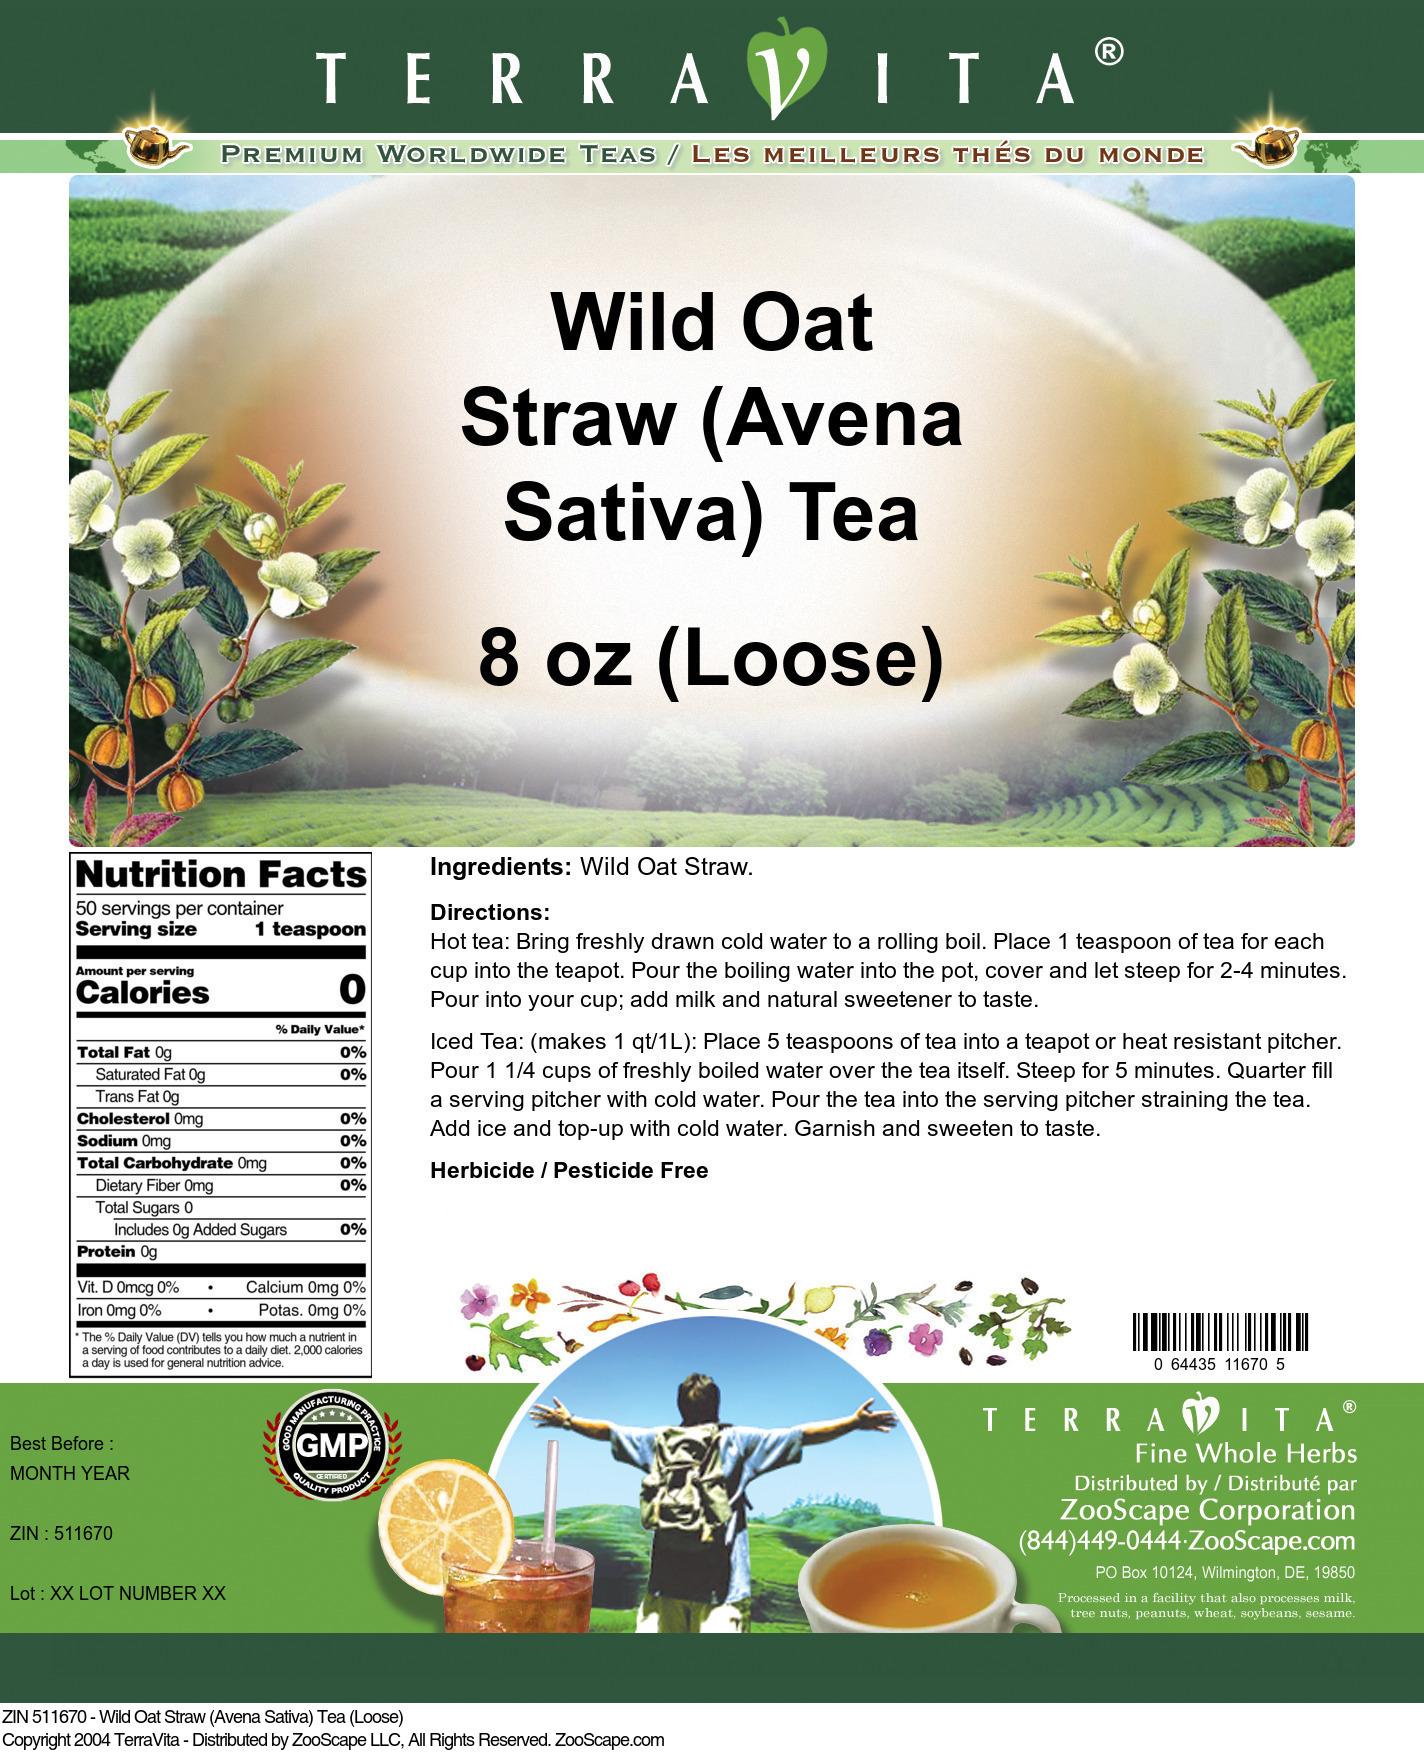 Wild Oat Straw (Avena Sativa) Tea (Loose)